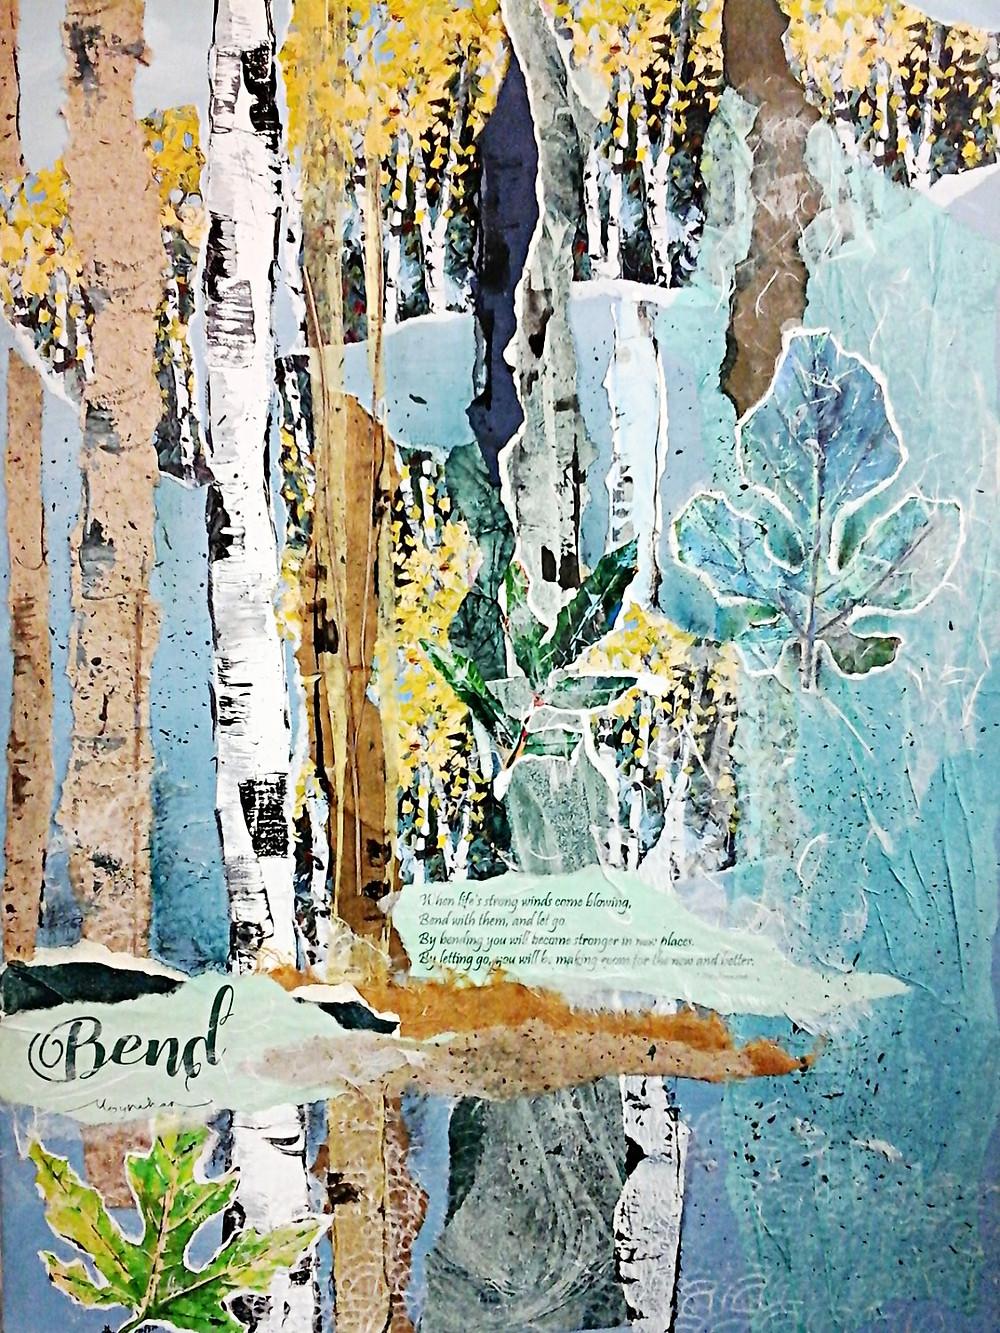 College by Kate Moynihan artist, inspired by poem, Bend, by Karen Salmansohn